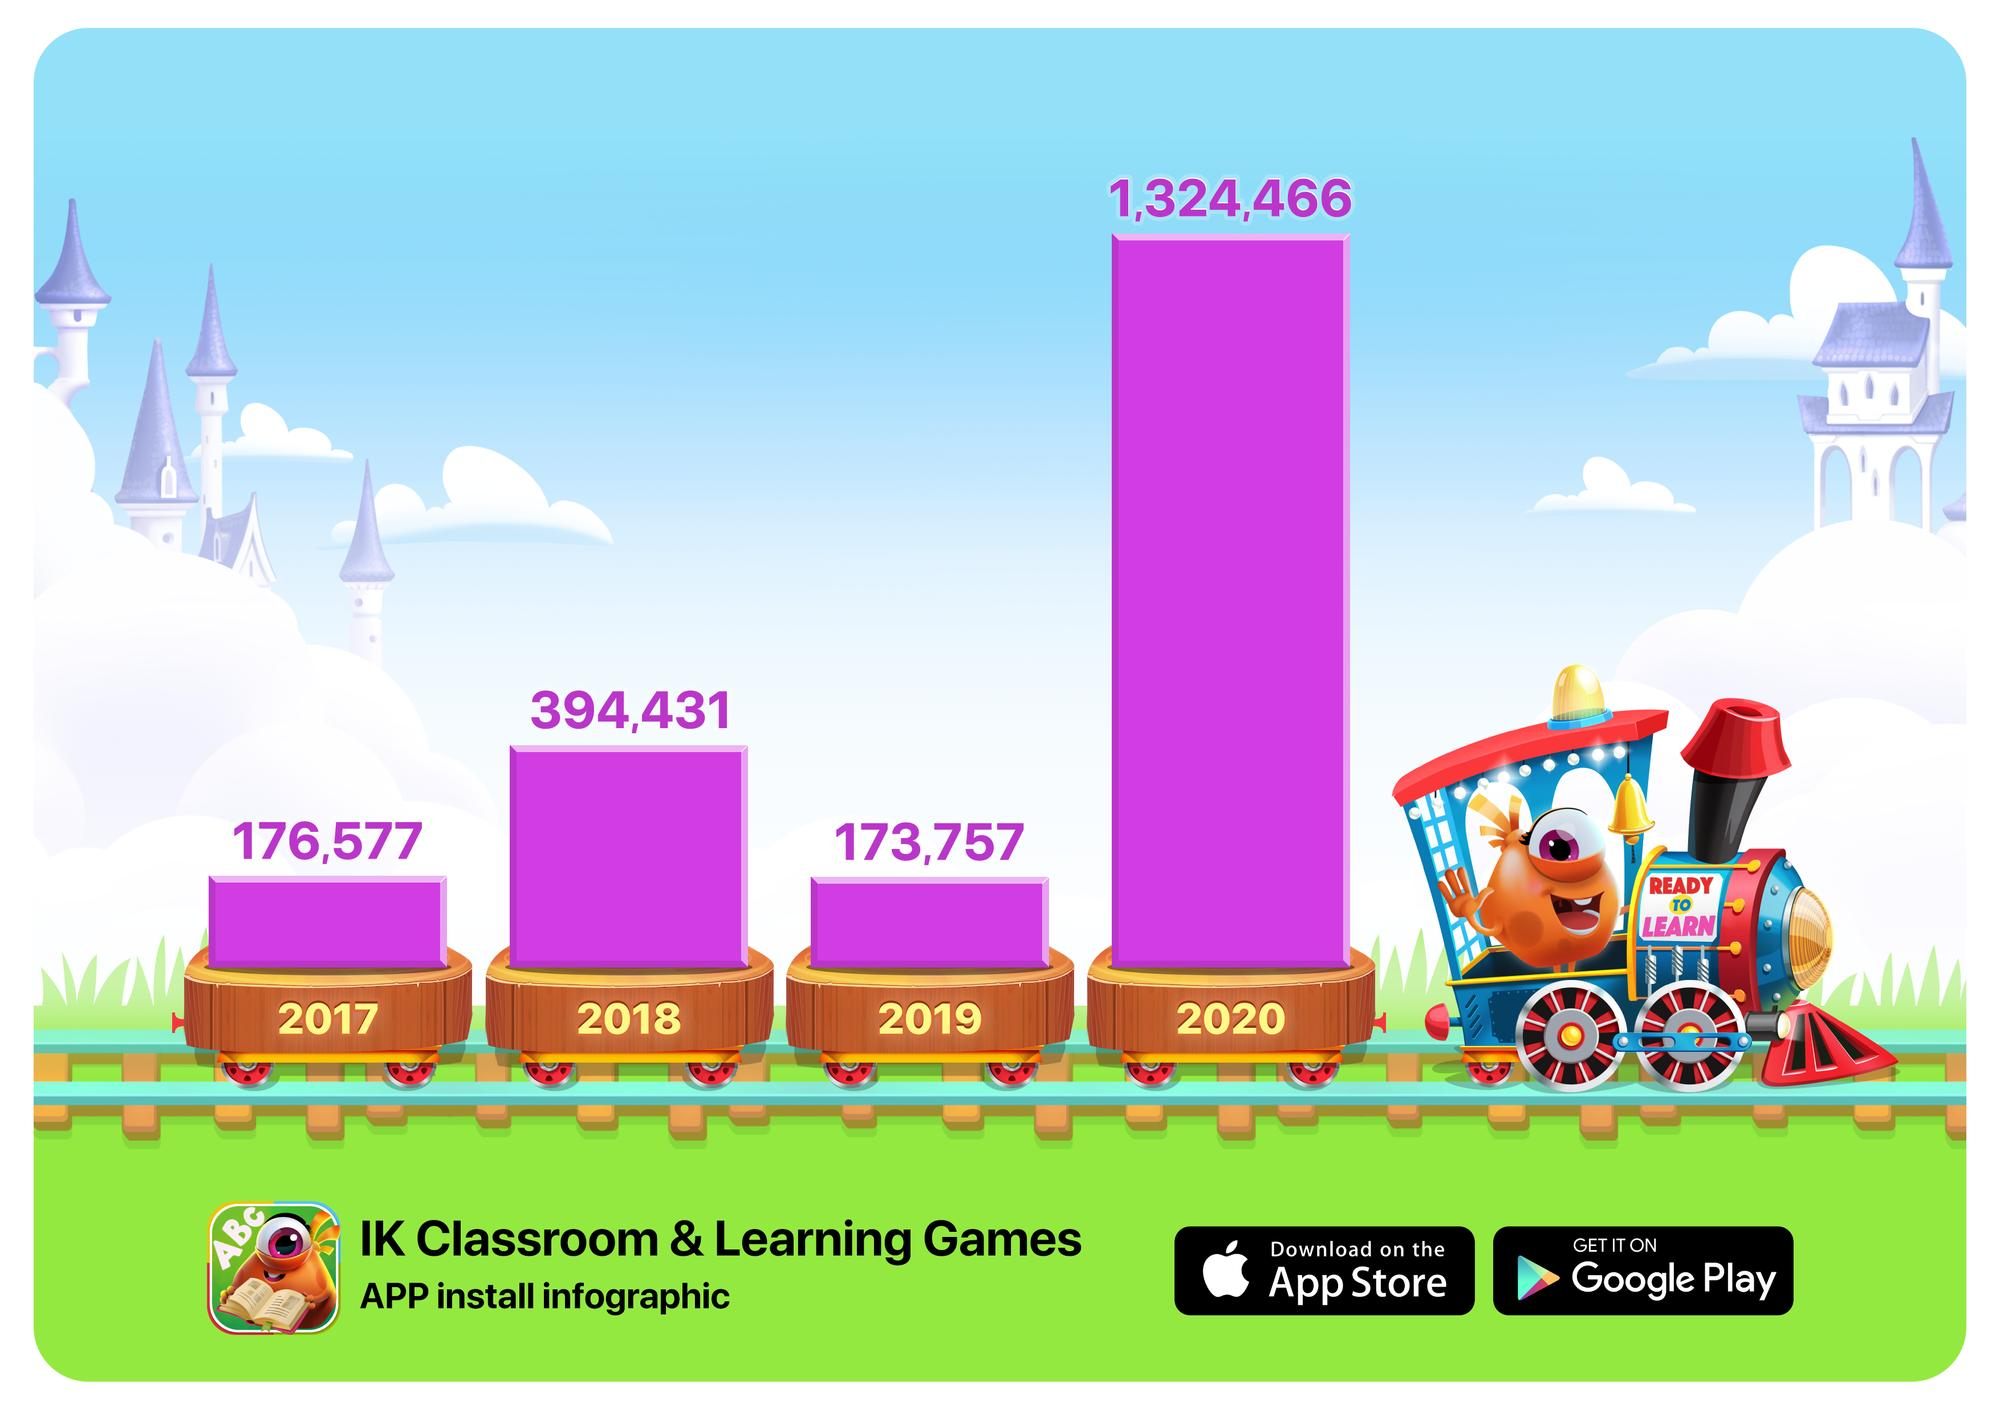 Количество установок приложения IntellectoKids Classroom & Learning games.